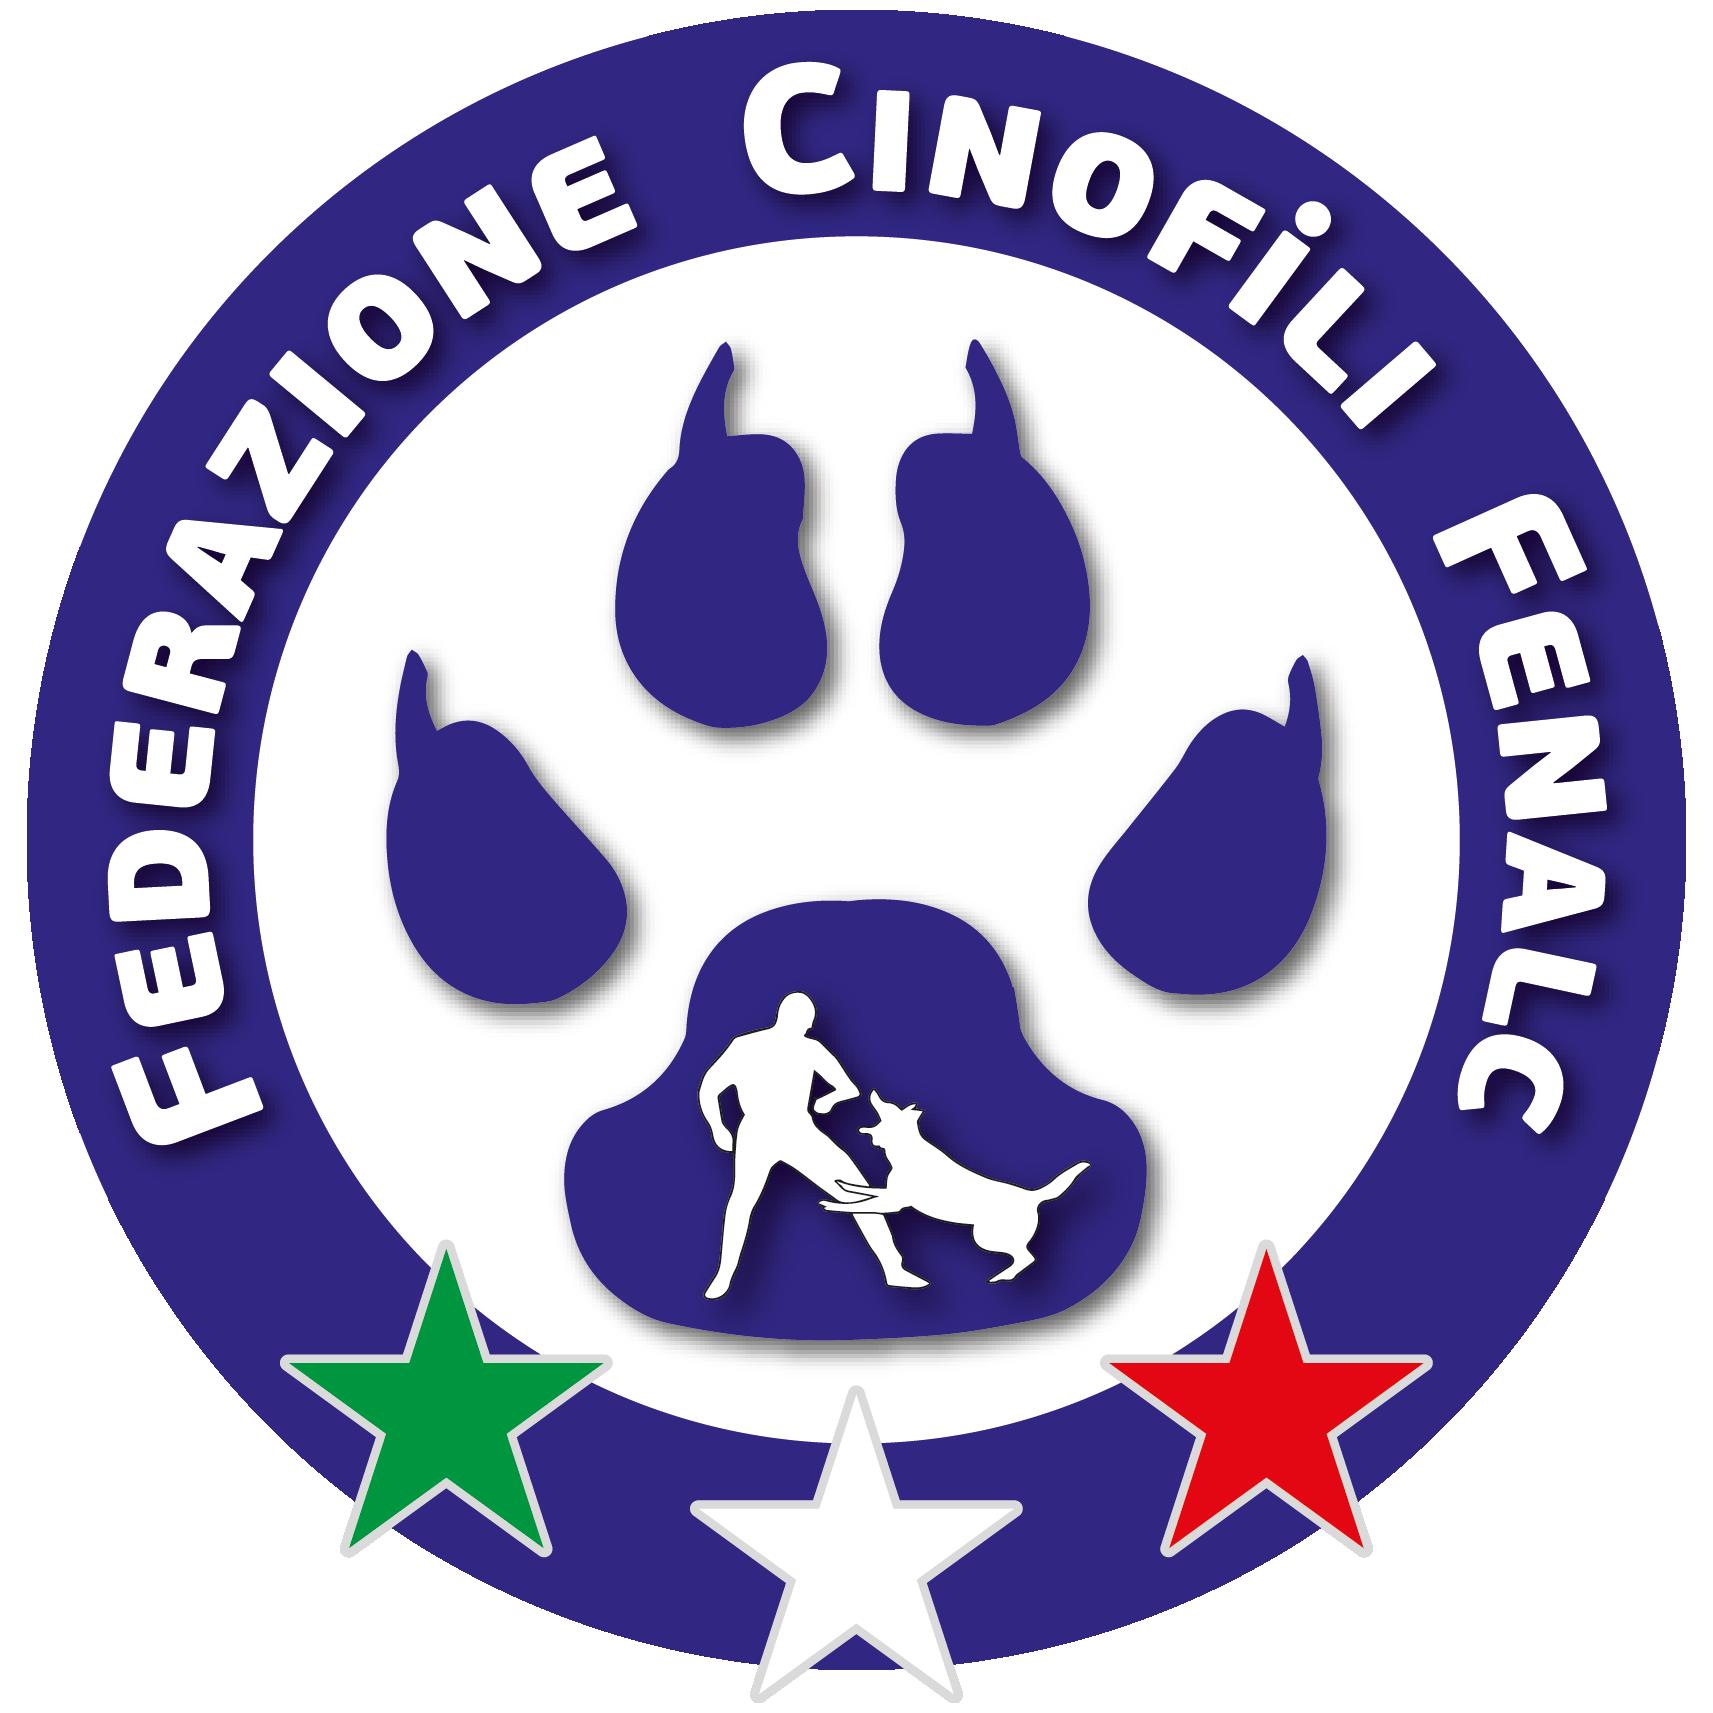 cinofili_fenalc